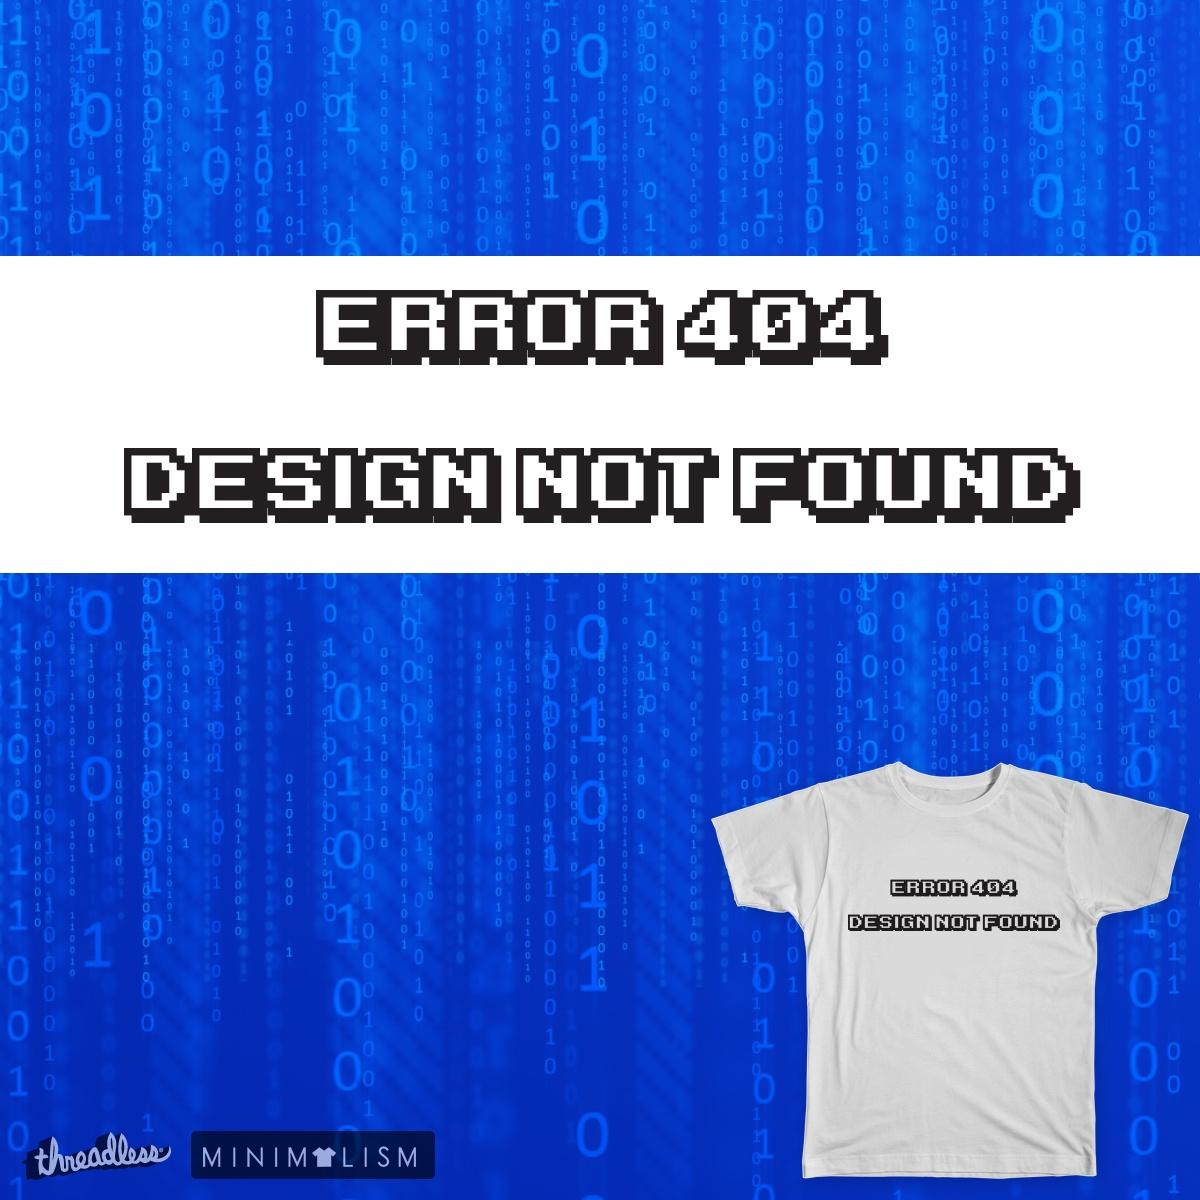 Error 404 by WallaceKnight on Threadless